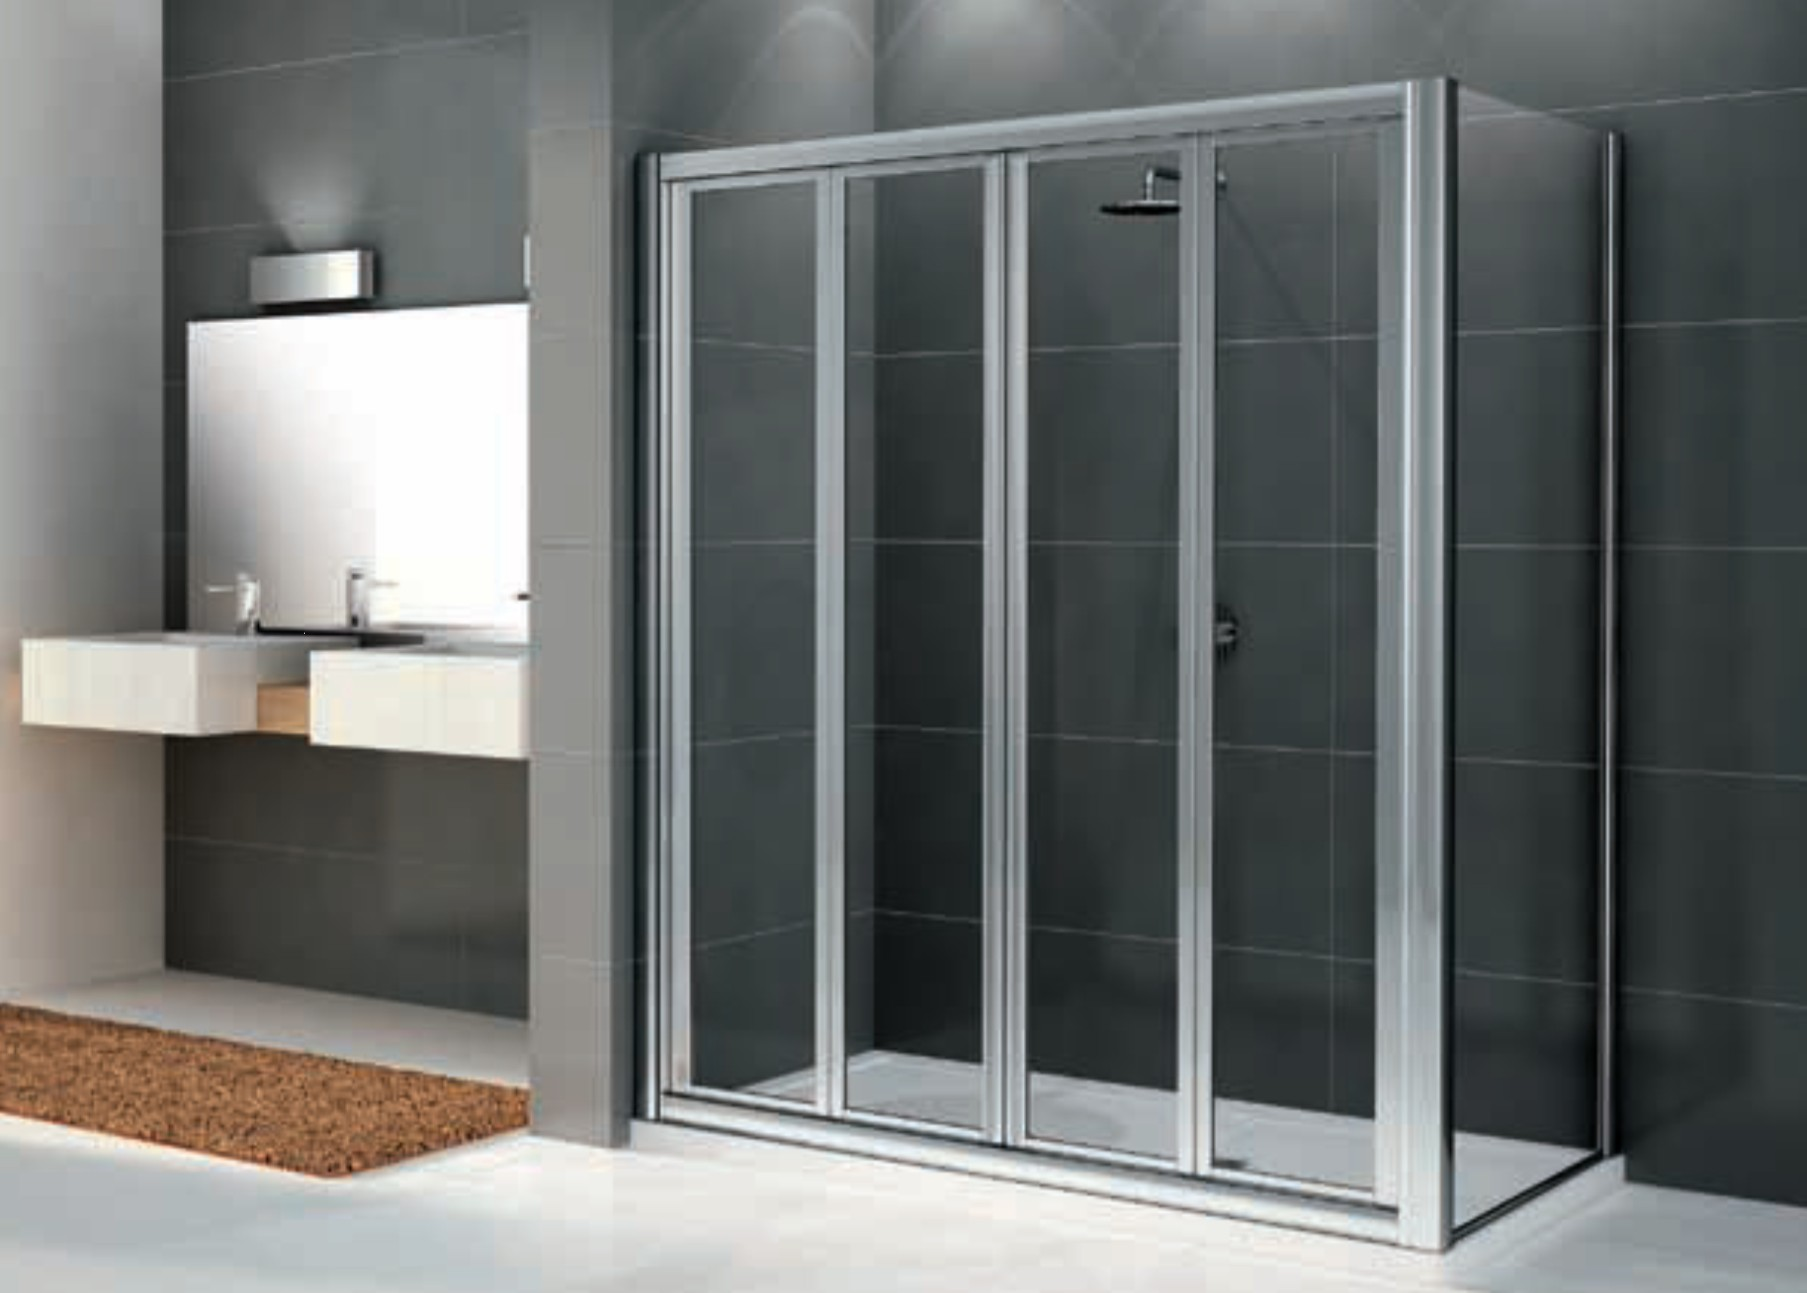 Parete in vetro per vasca da bagno - Box doccia vasca da bagno prezzi ...